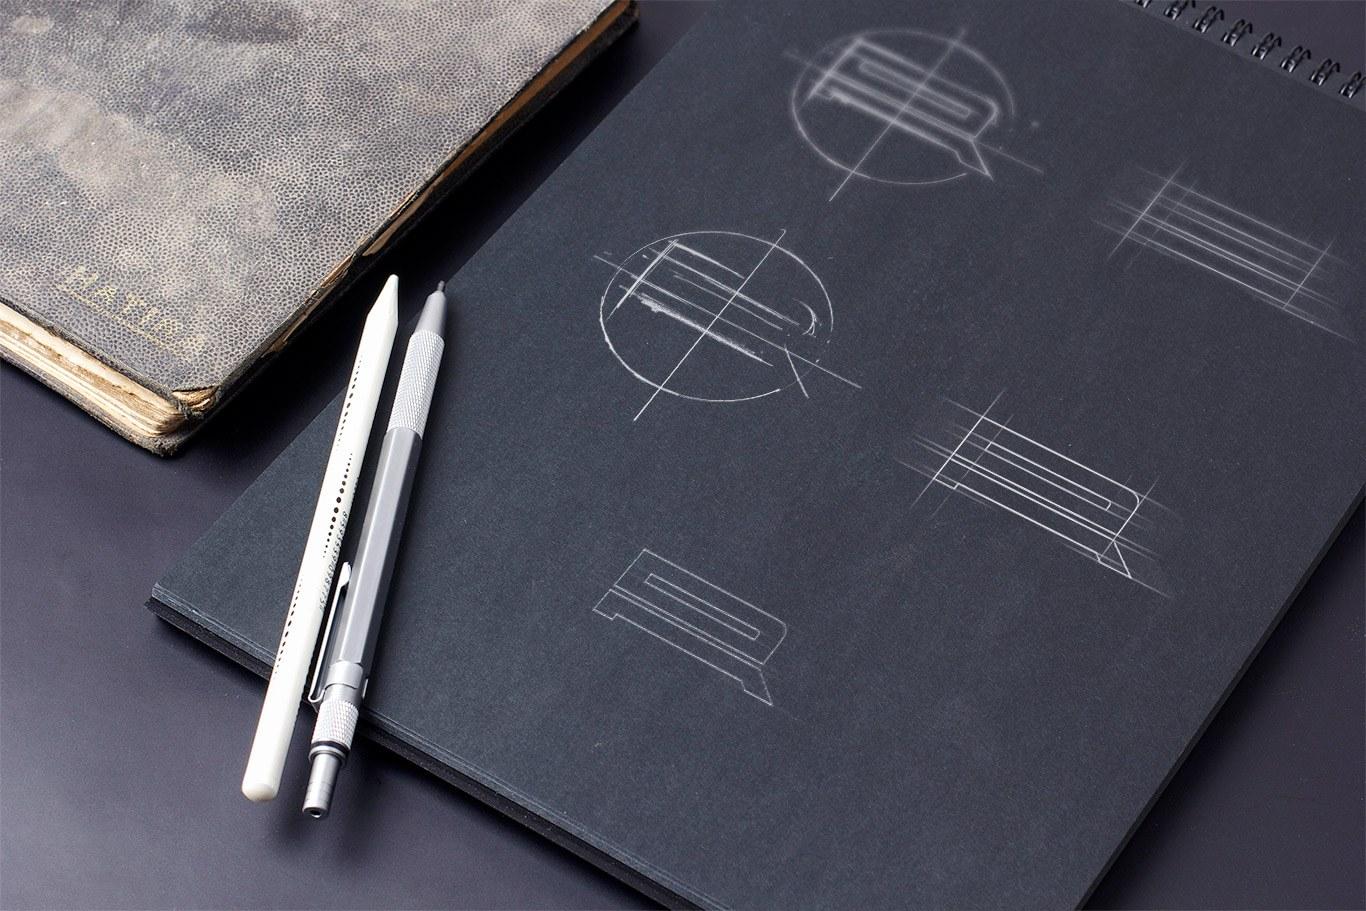 ar monogram sketches